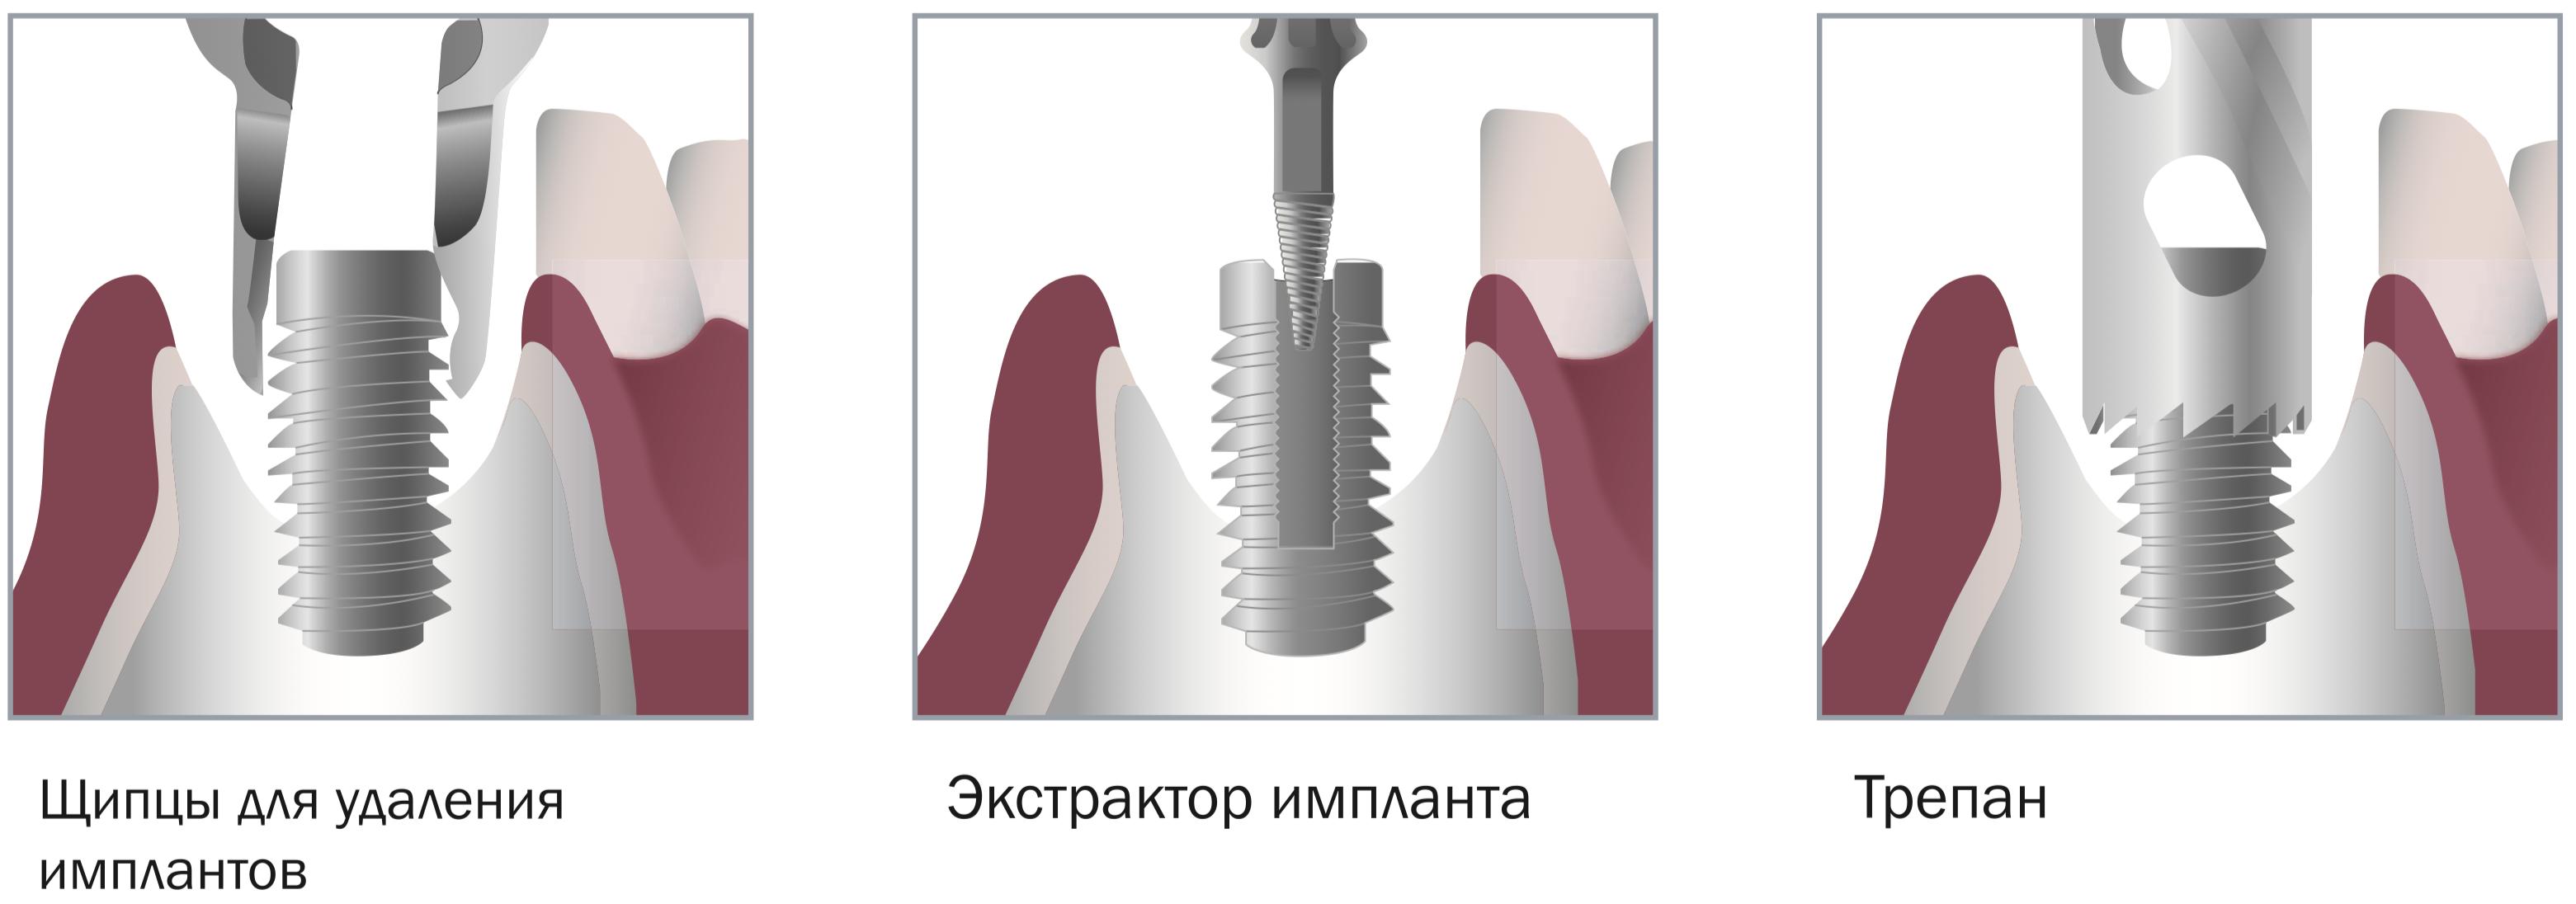 Техника применения Implant Remover Kit